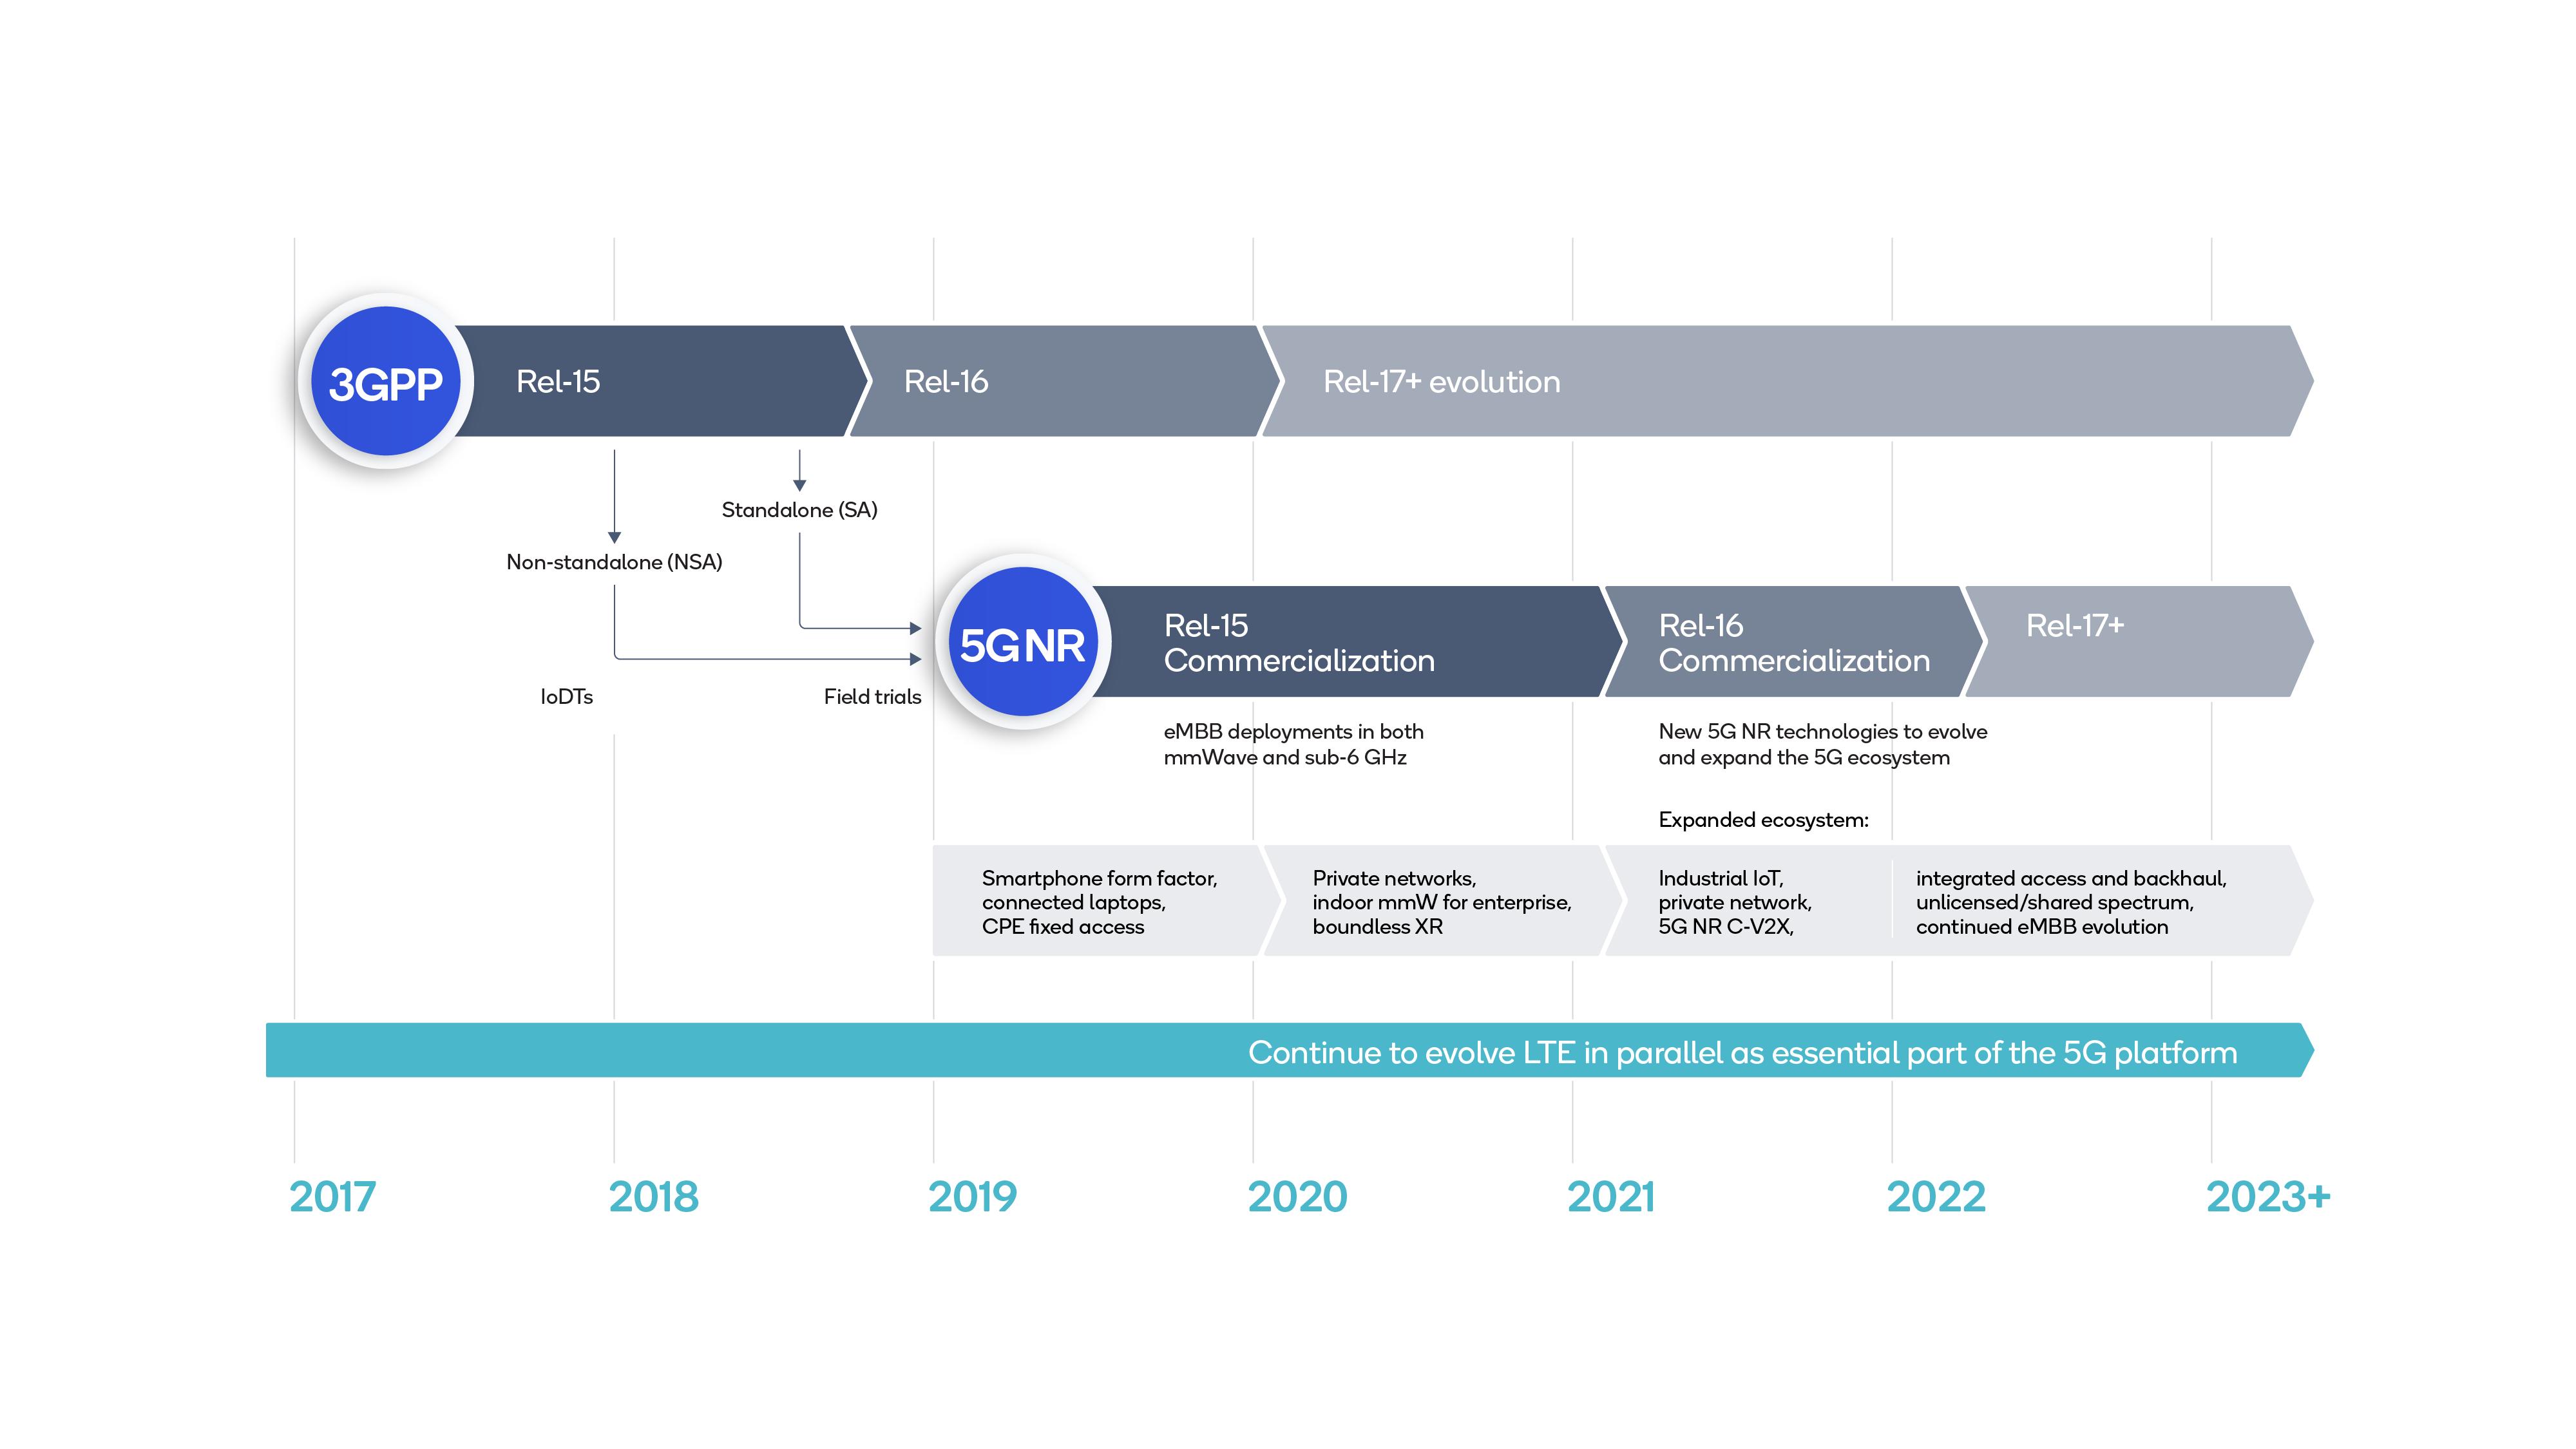 Figure 1: 5G roadmap